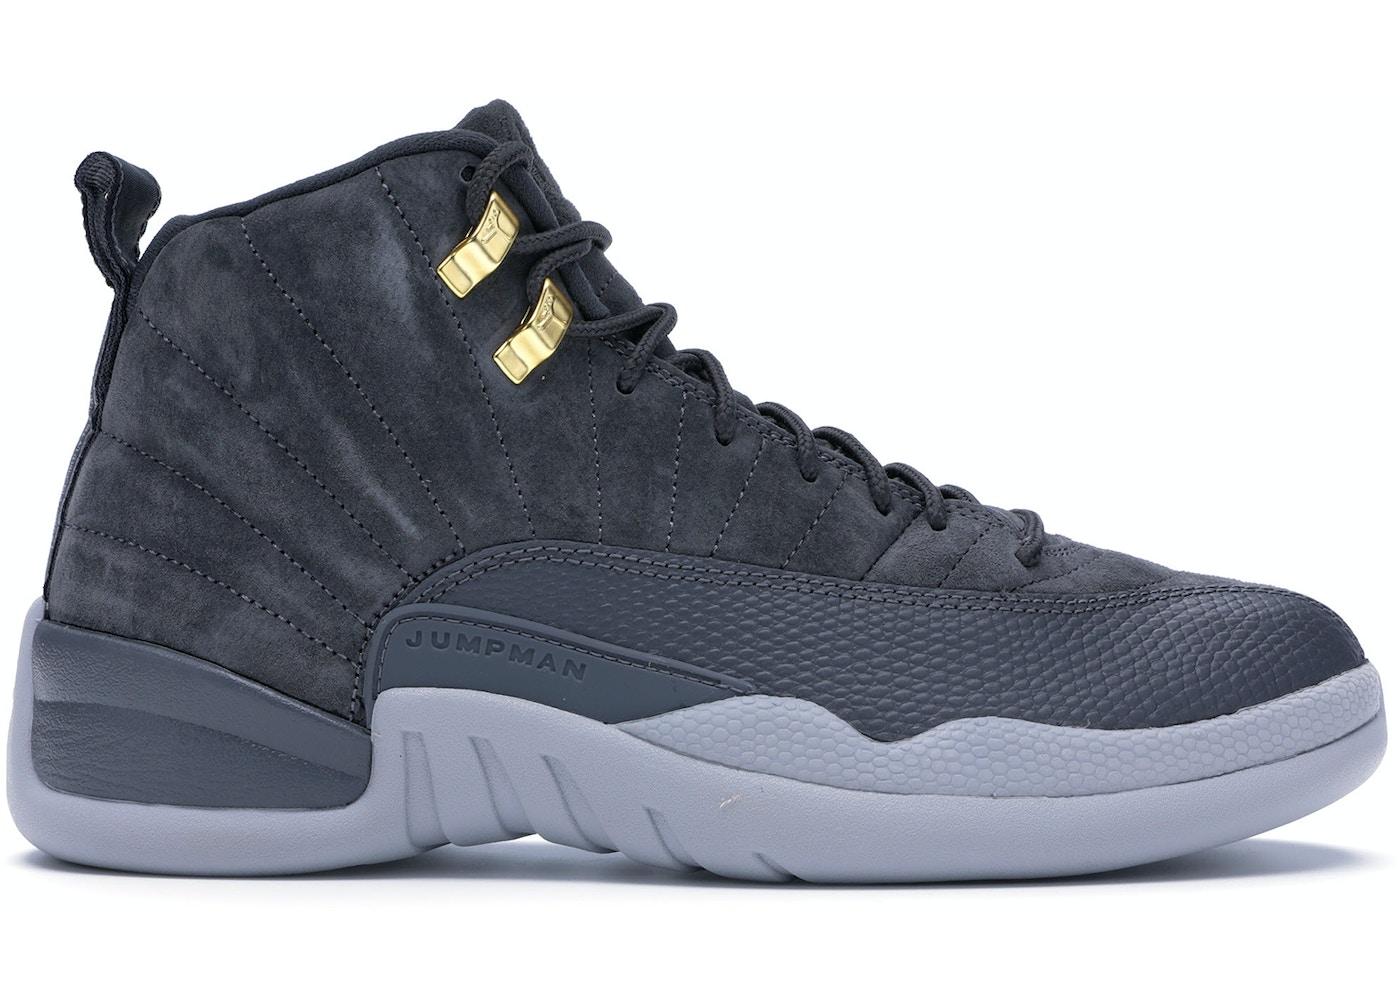 cheap for discount ec85a d17cf Buy Air Jordan 12 Shoes   Deadstock Sneakers